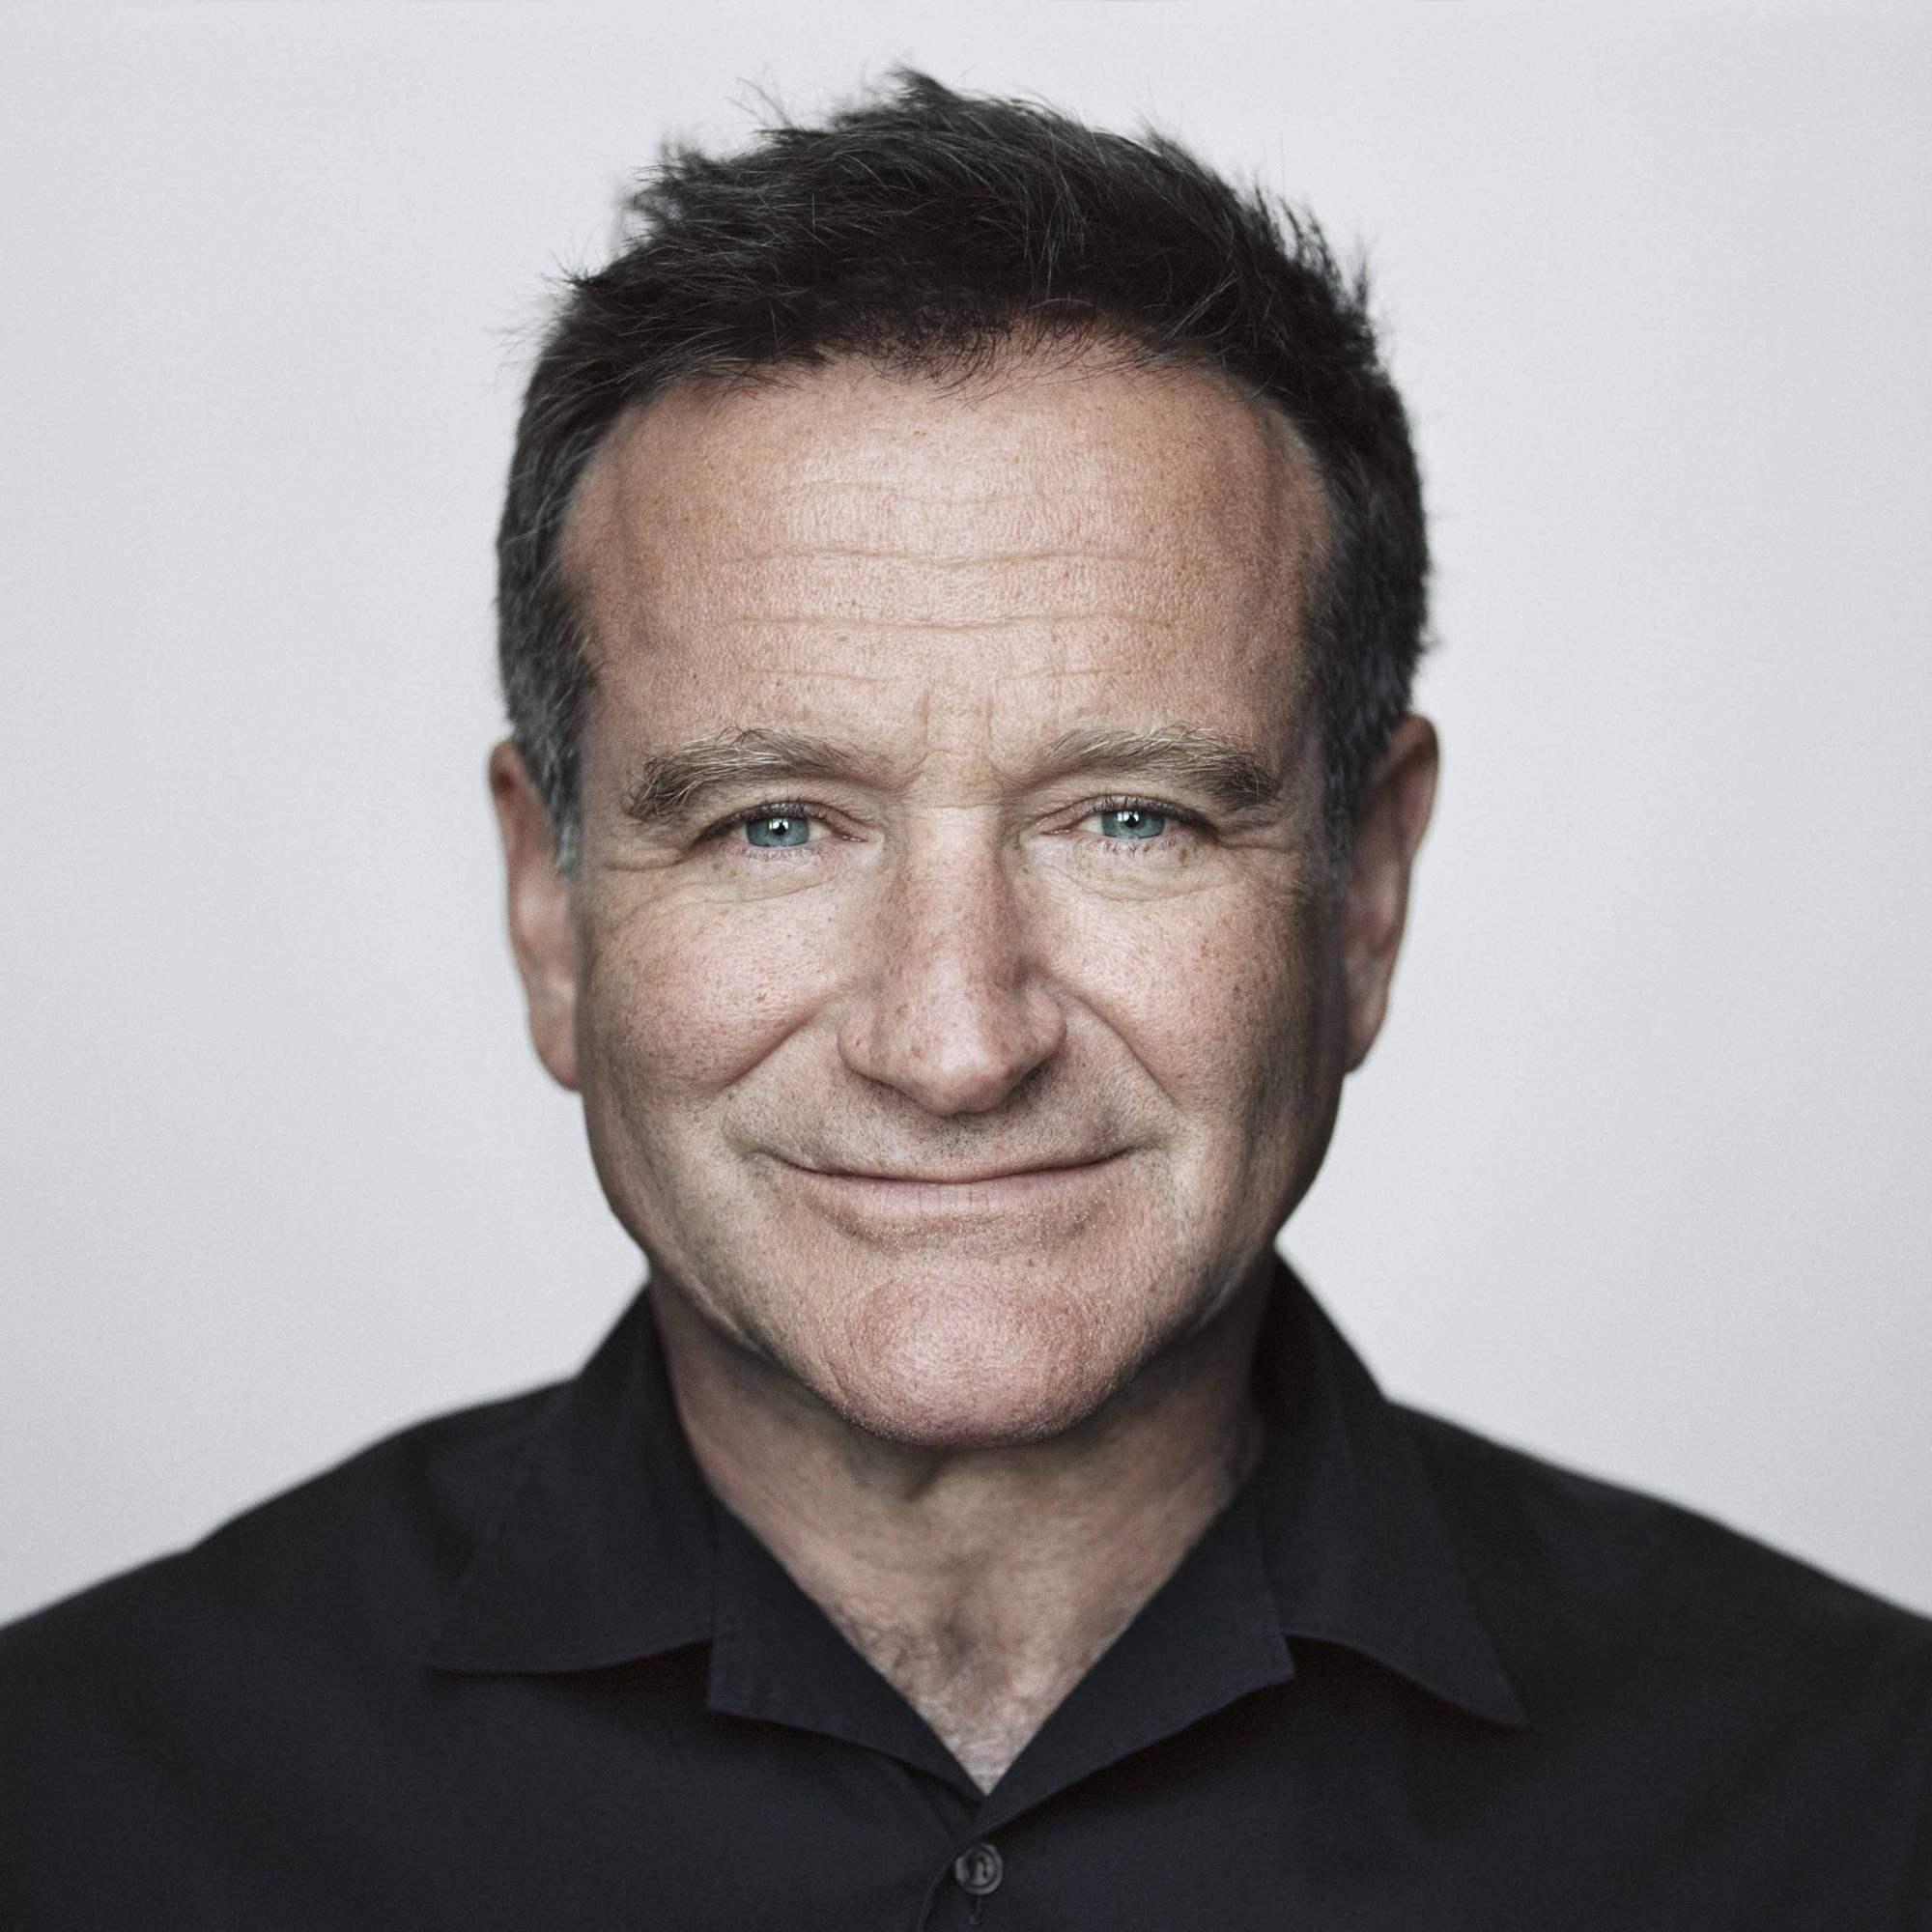 ¿Cuánto mide Robin Williams? - Real height Robin